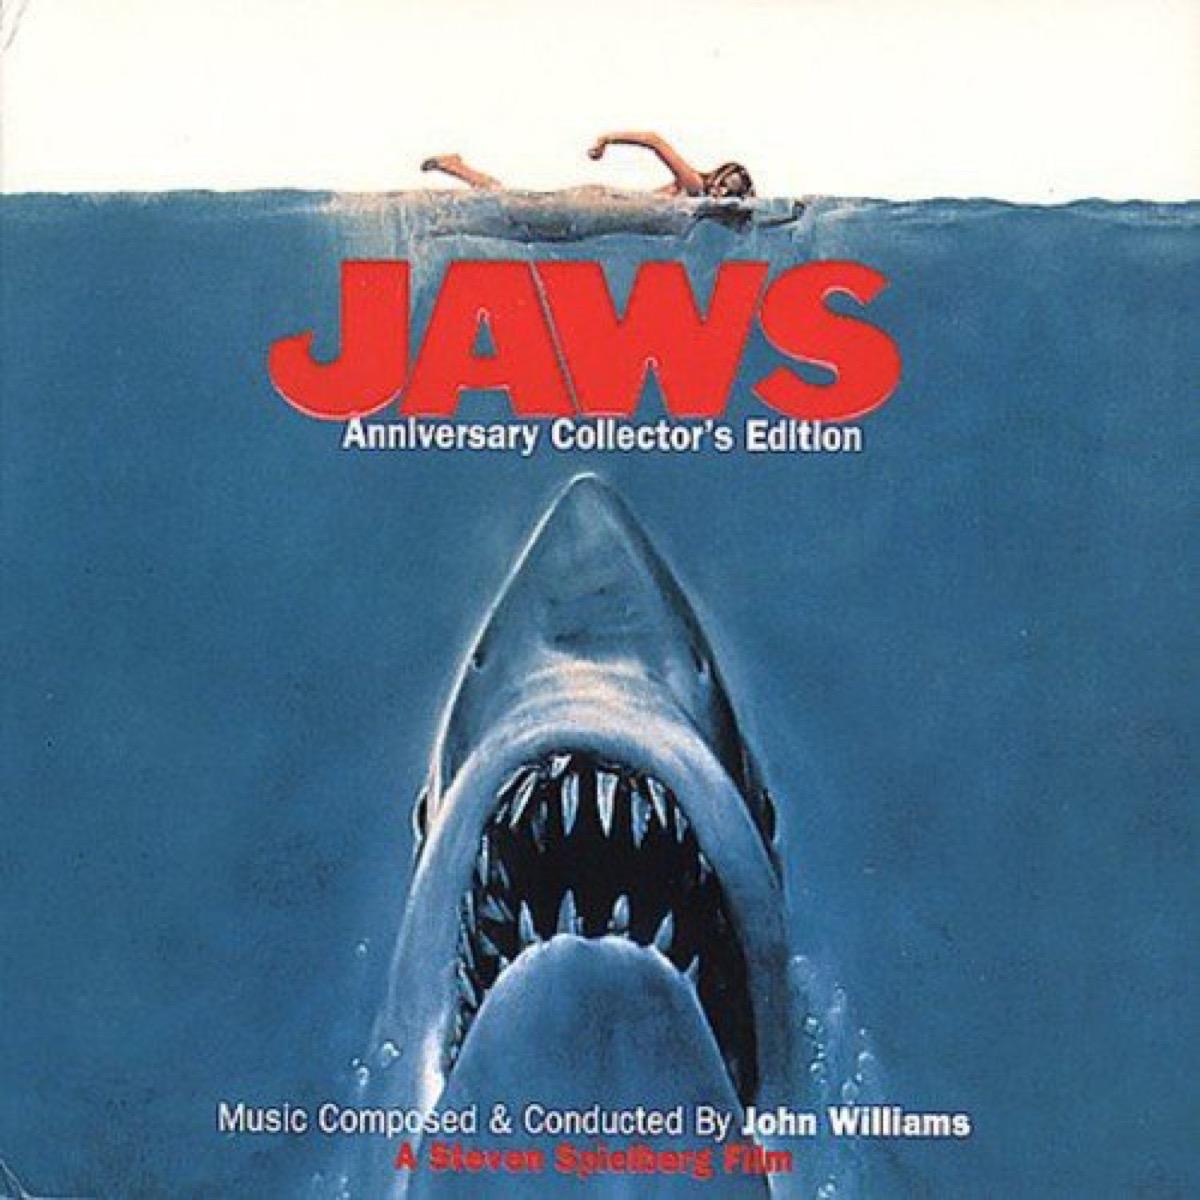 jaws soundtrack album cover